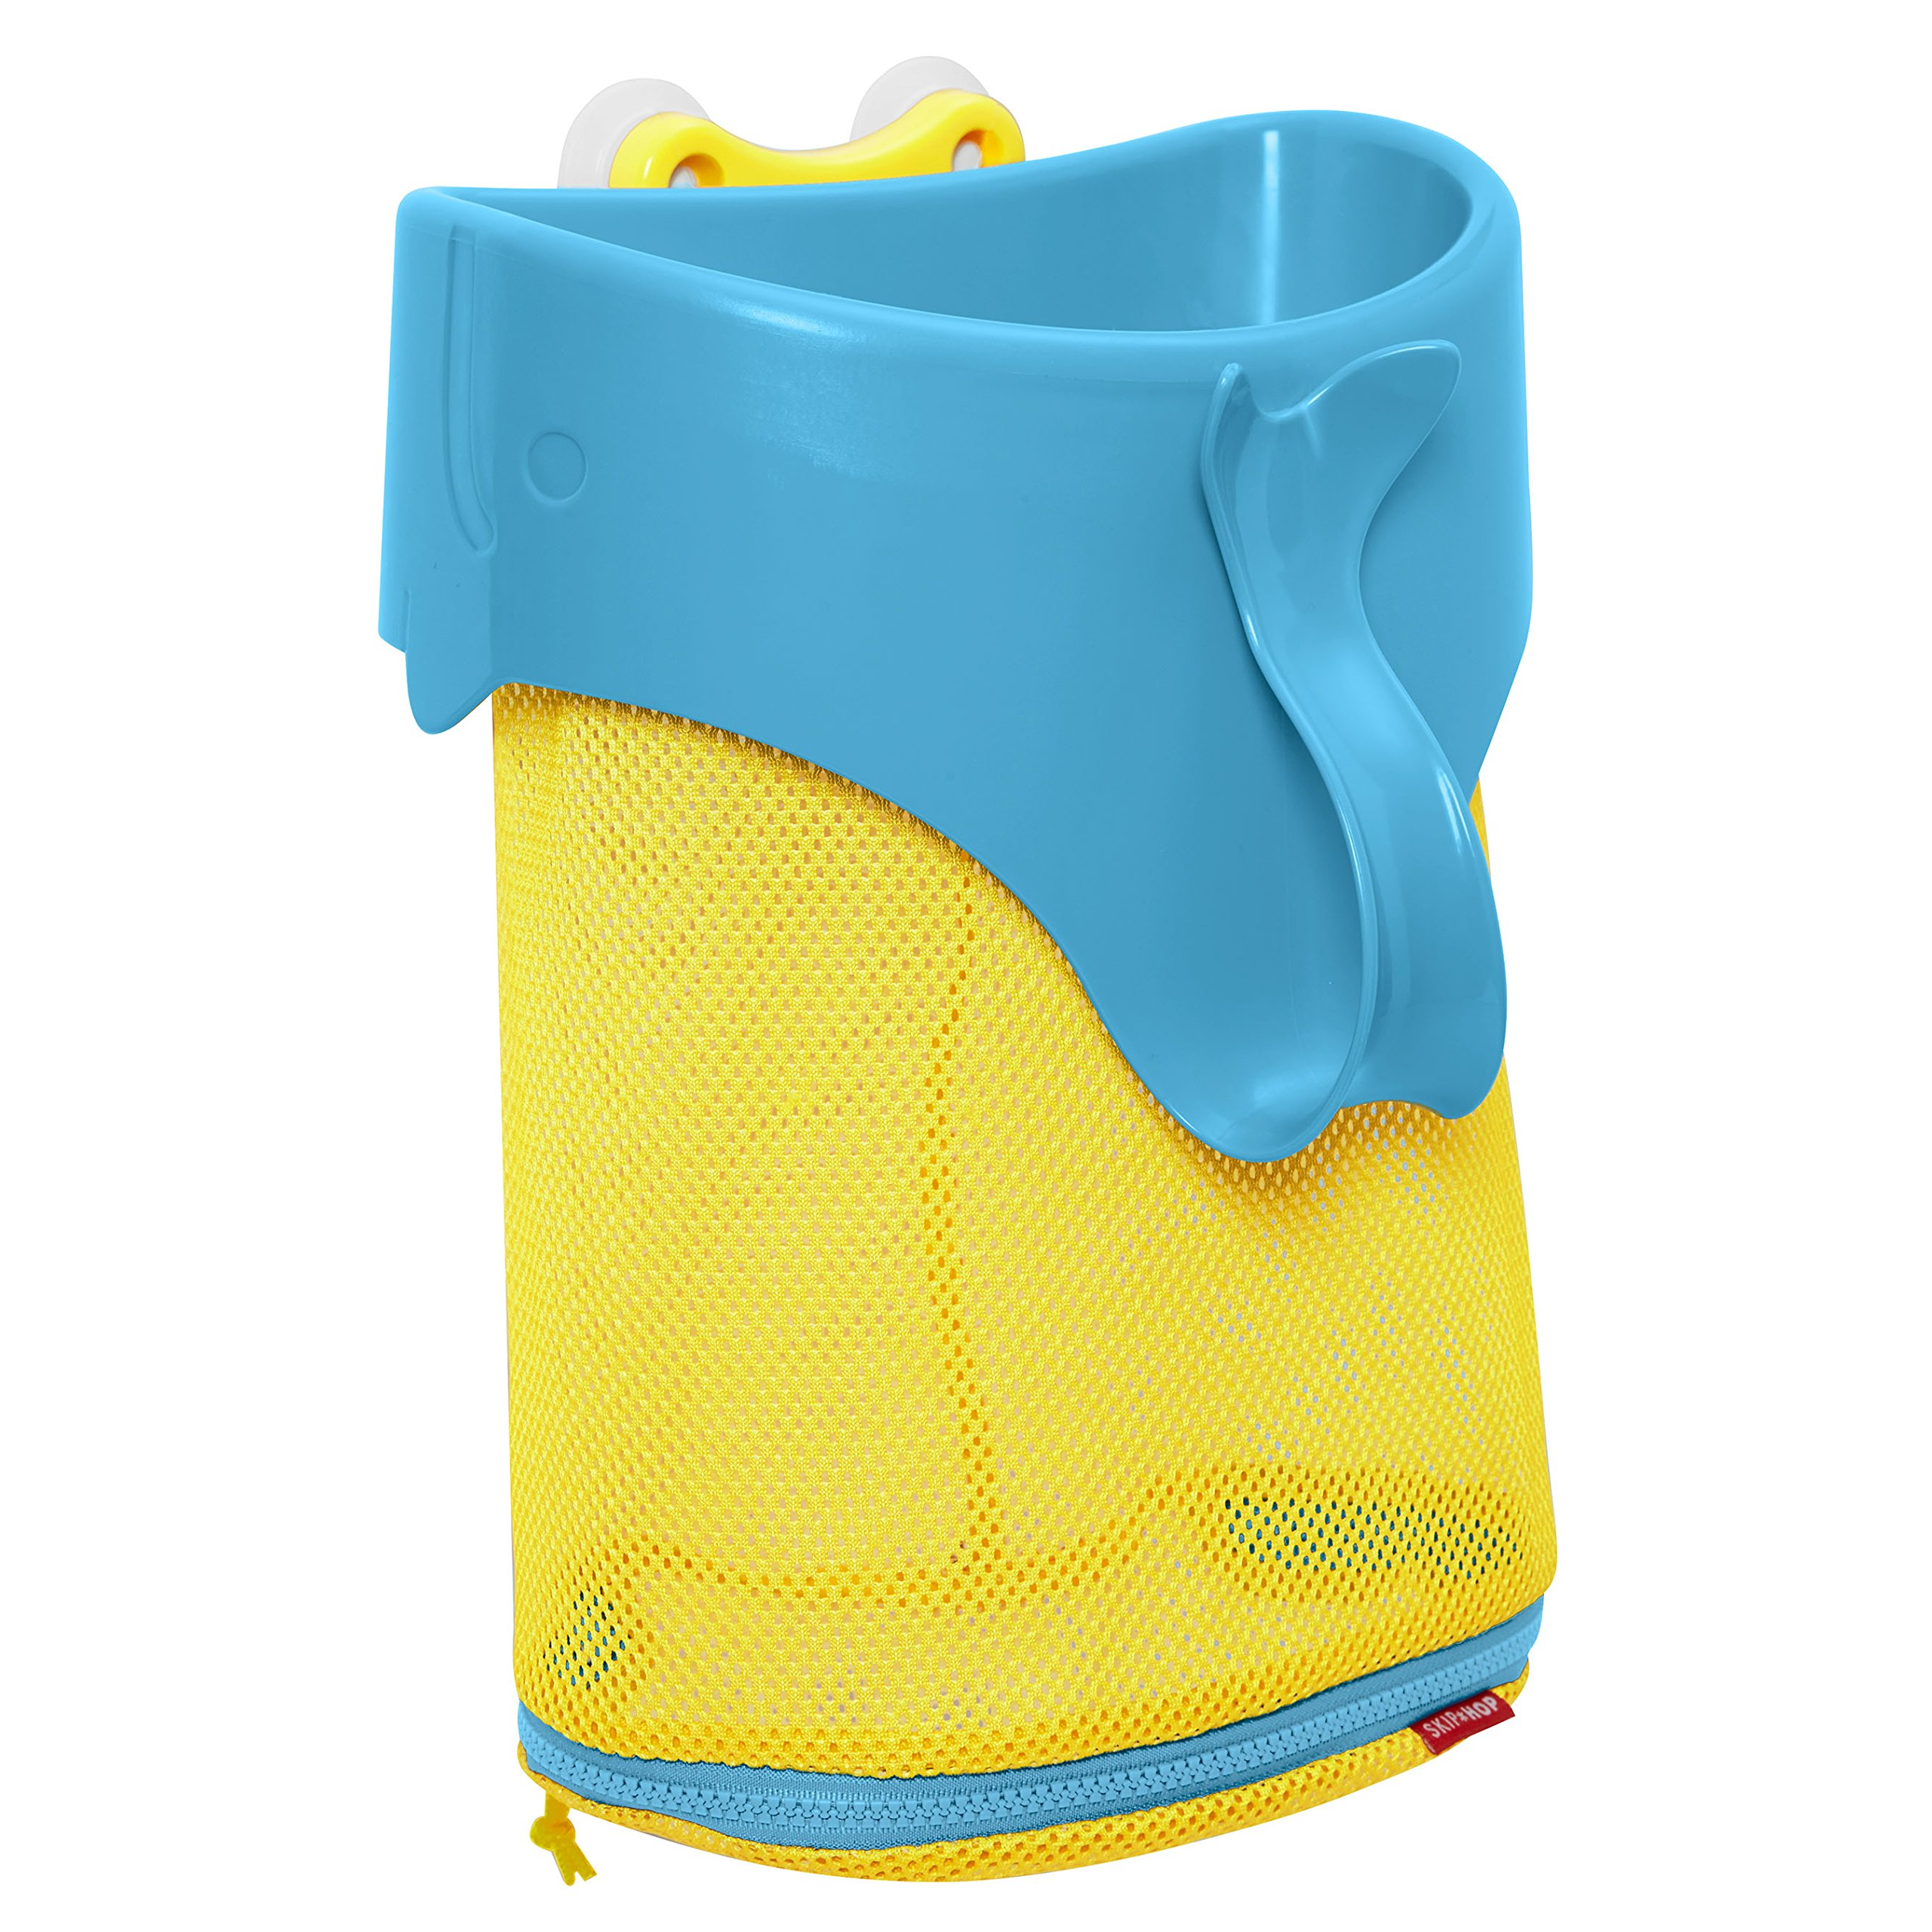 Skip Hop Moby Scoop & Splash Bath Toy Organizer And Storage, Blue by Skip Hop